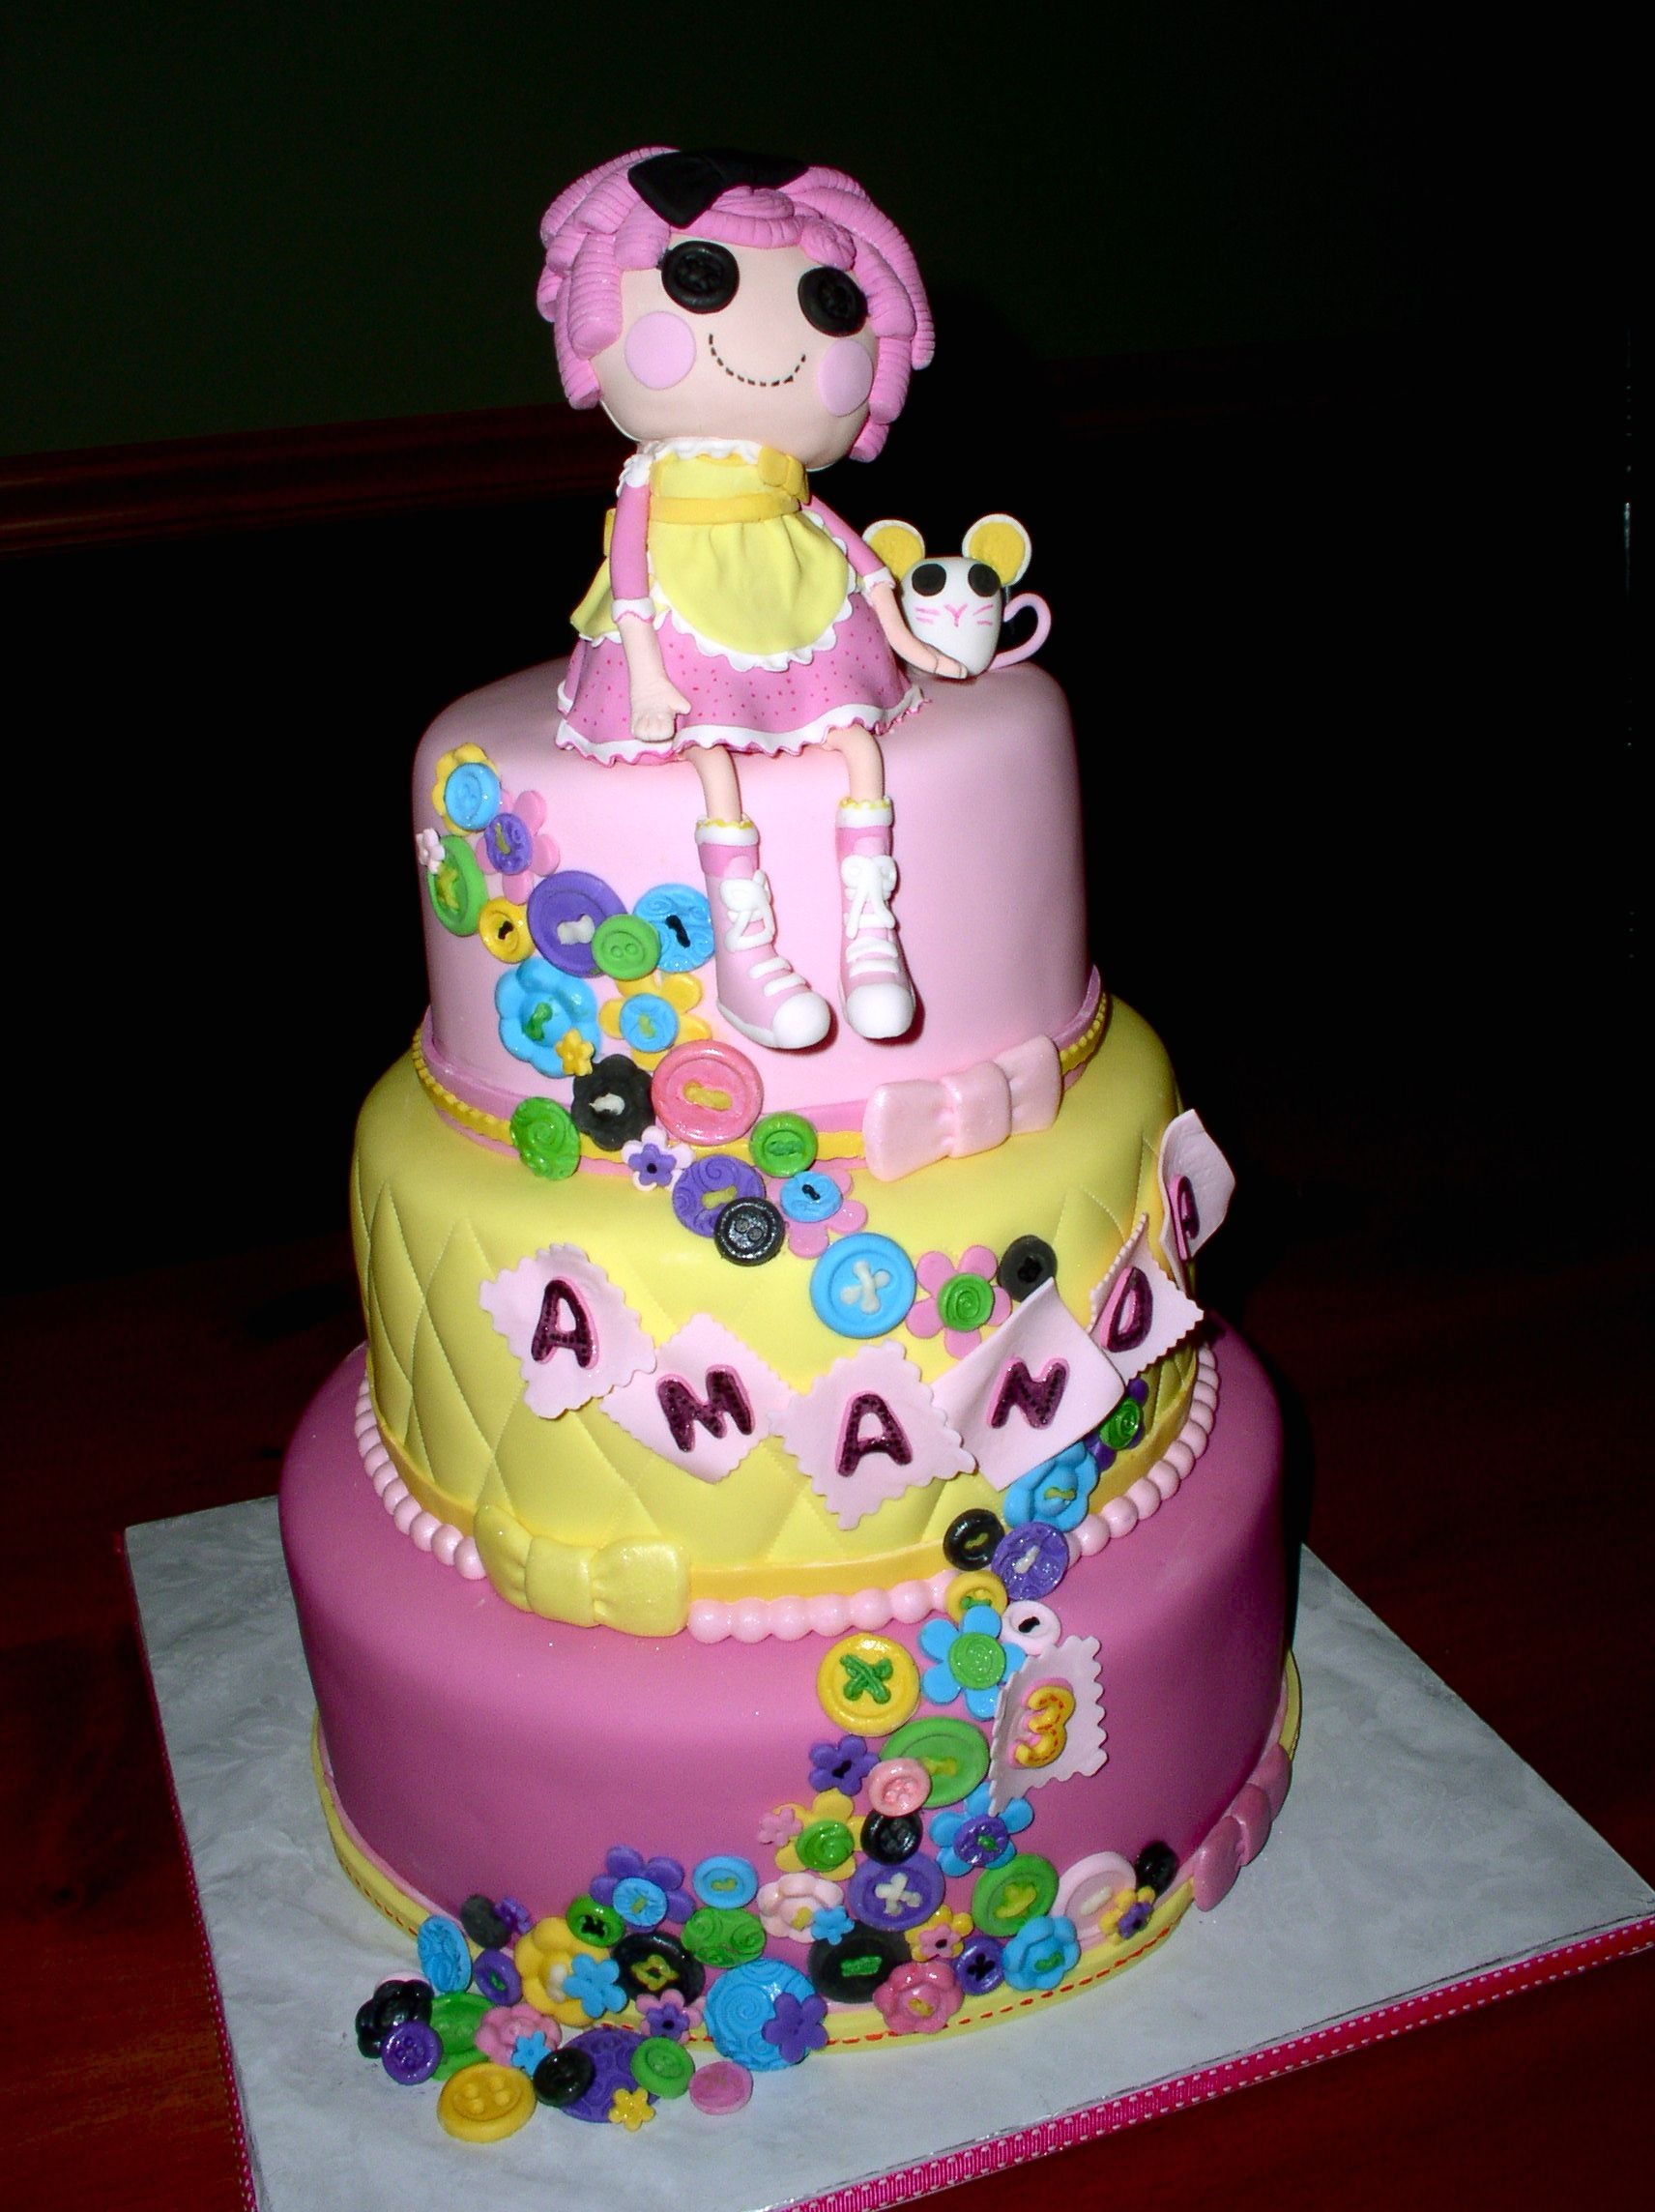 lalaloopsy cakes � decoration ideas little birthday cakes